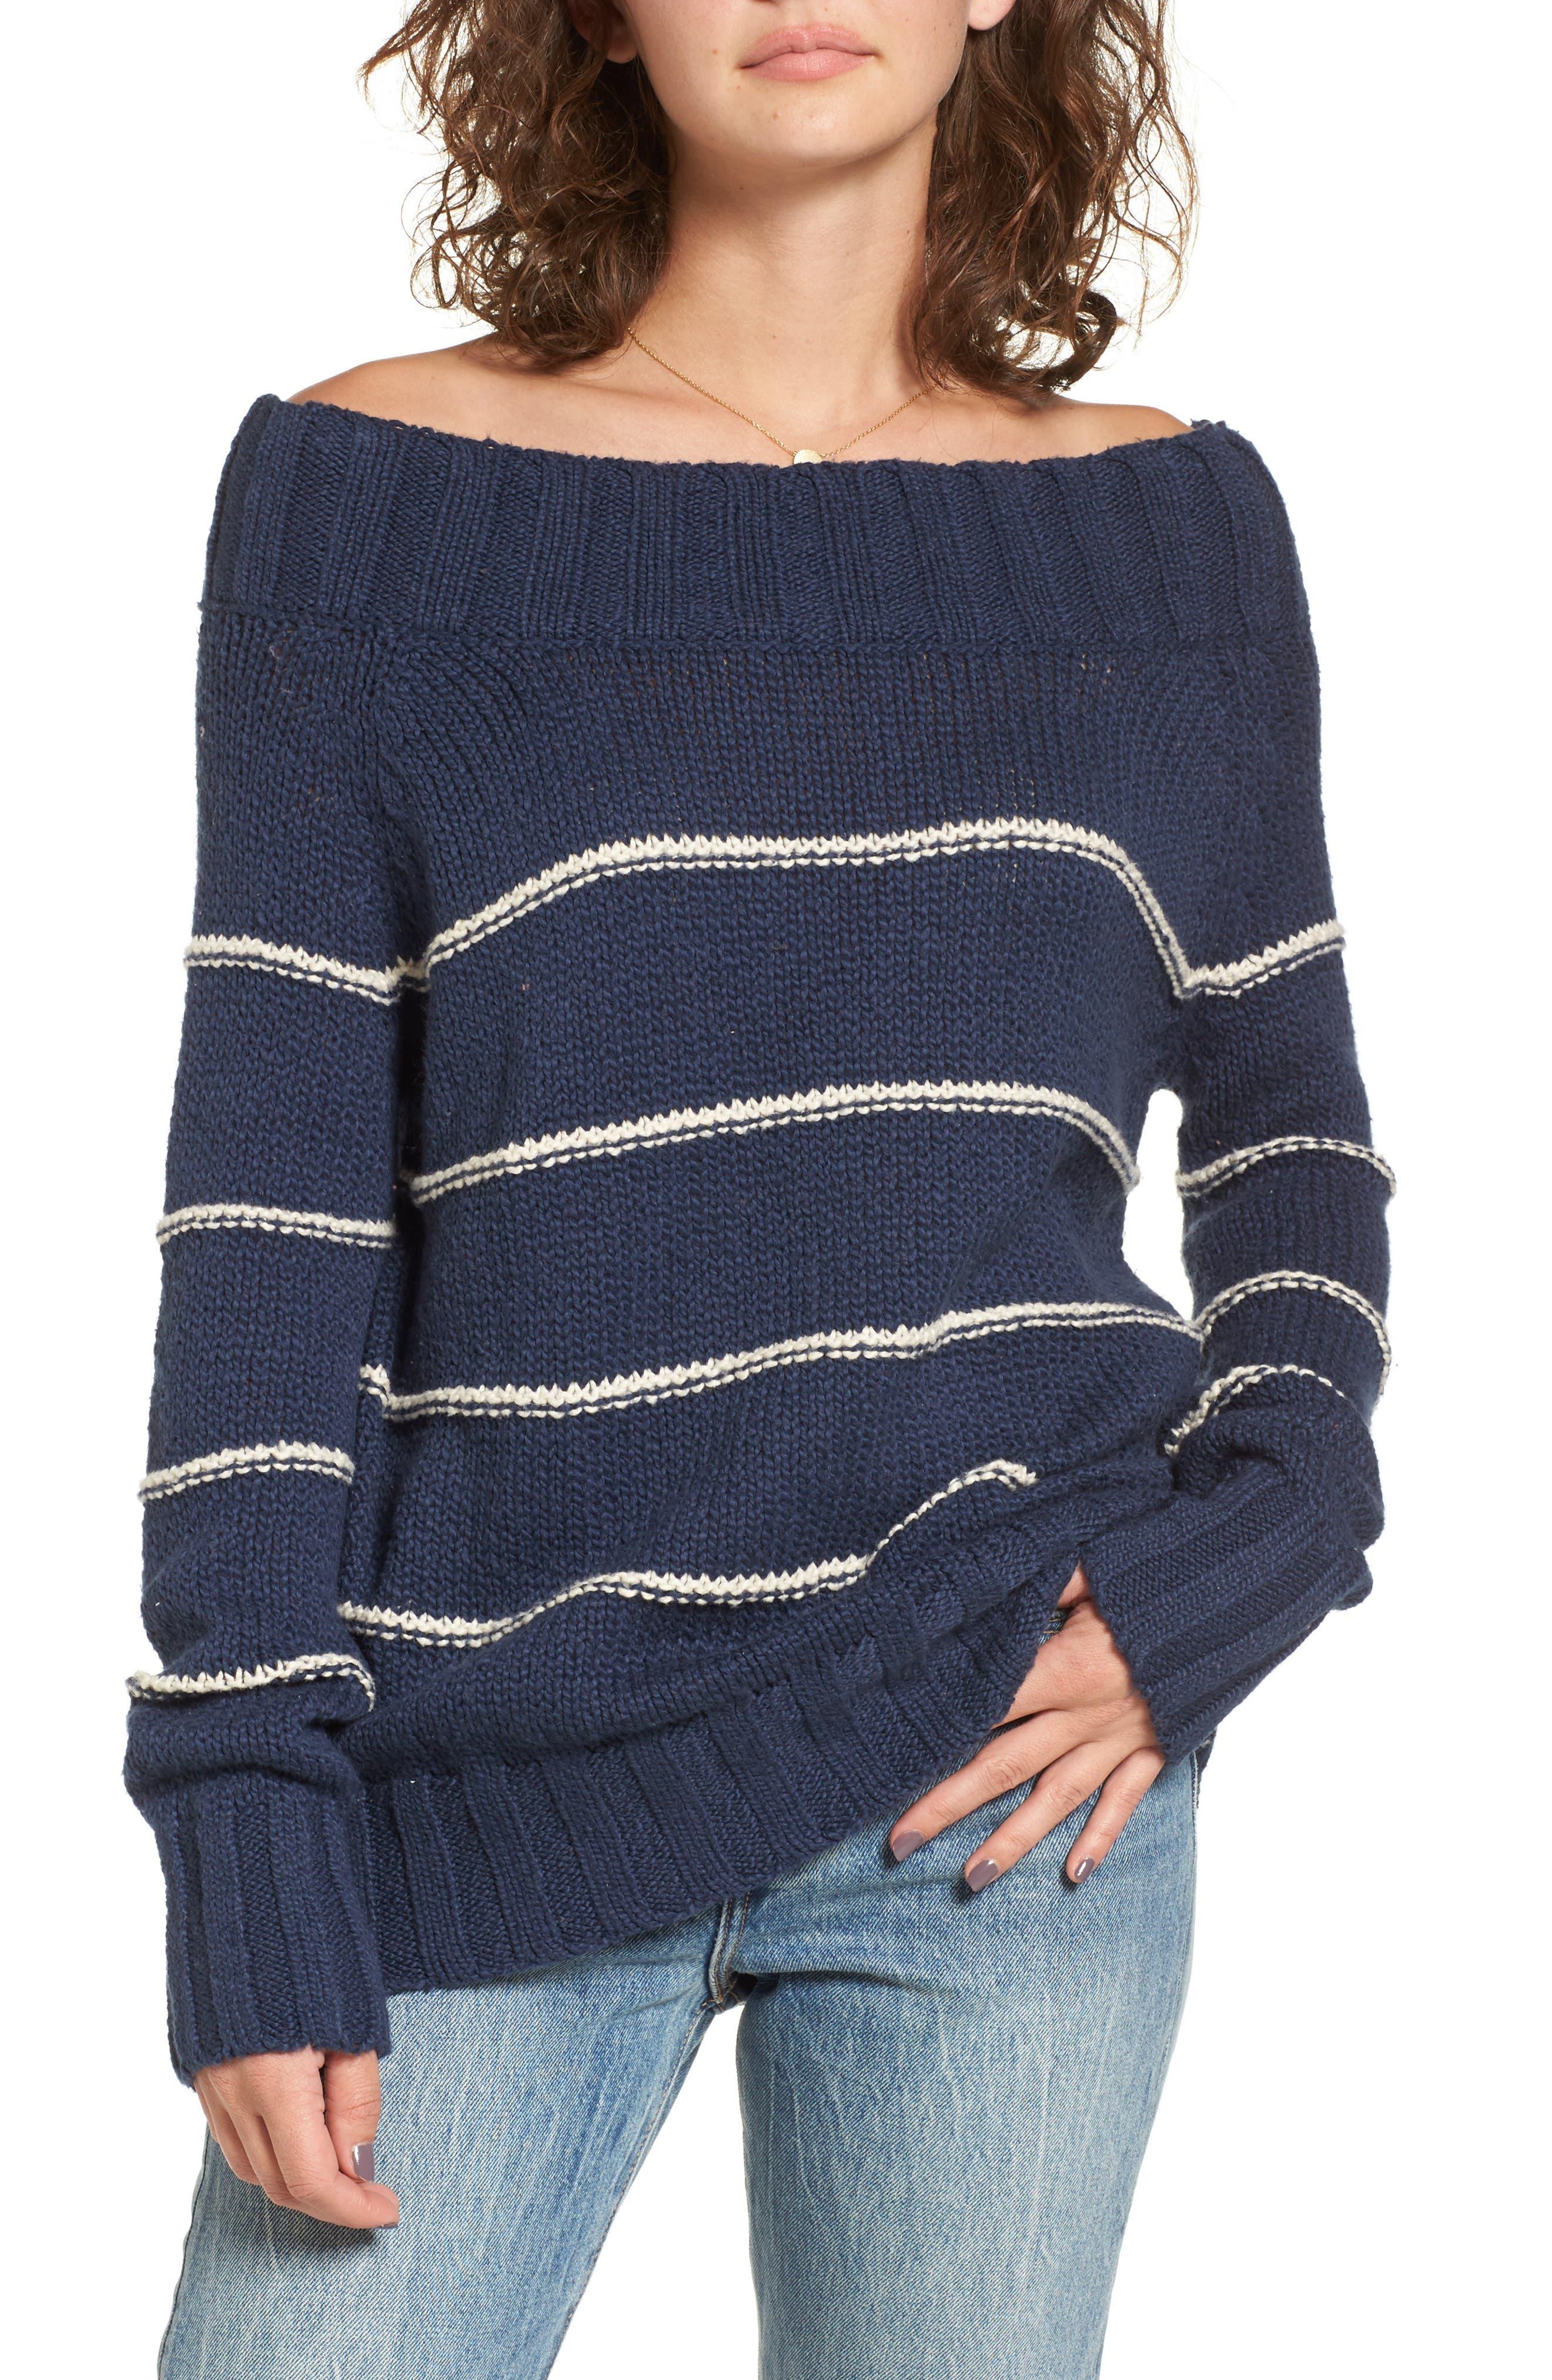 Alternate Image 1 Selected - Billabong Snuggle Down Off the Shoulder Sweater